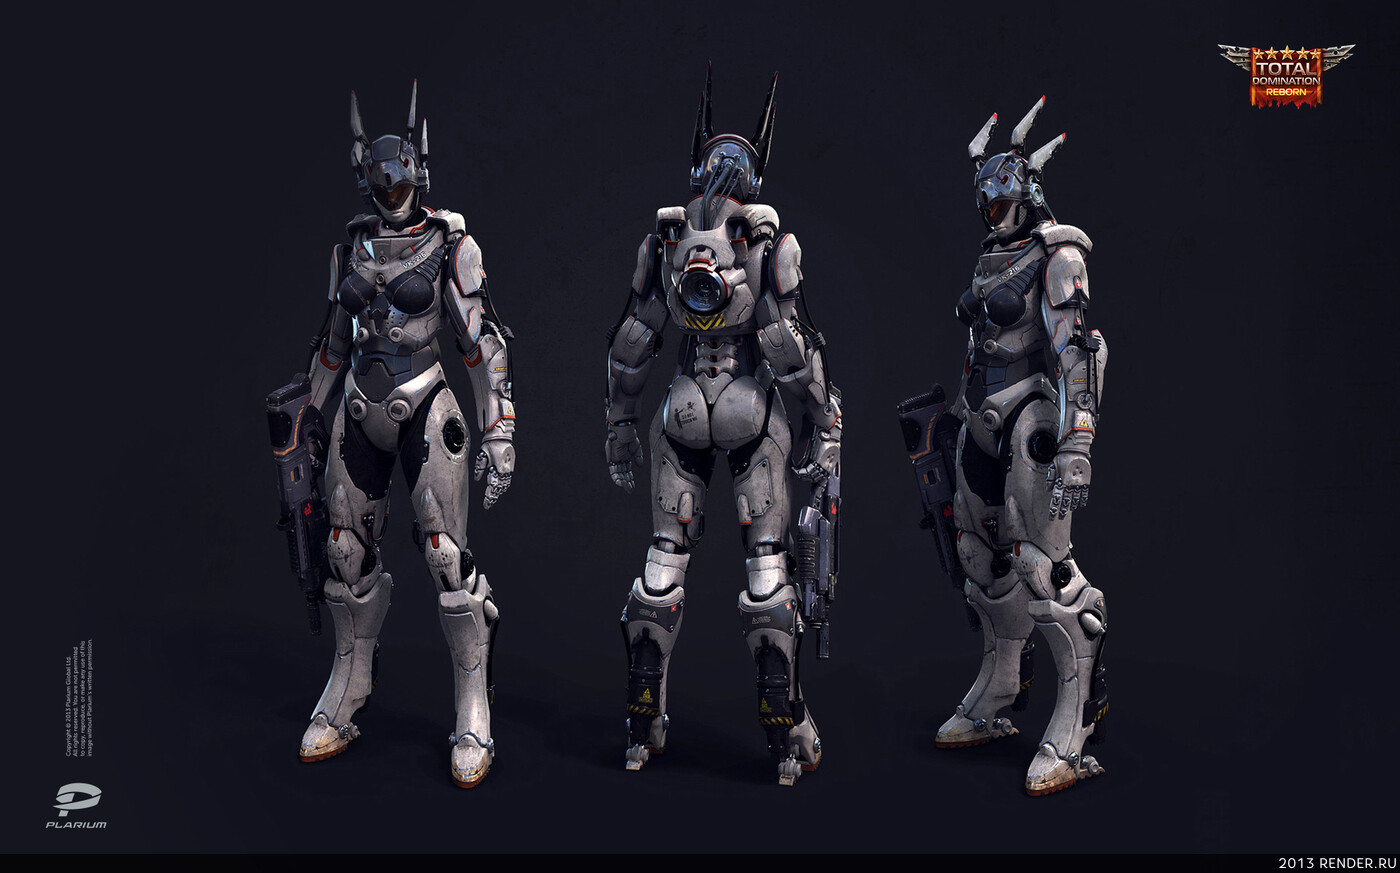 digital 3d, character, game art, Plarium, cyborg, robot, sci-fi